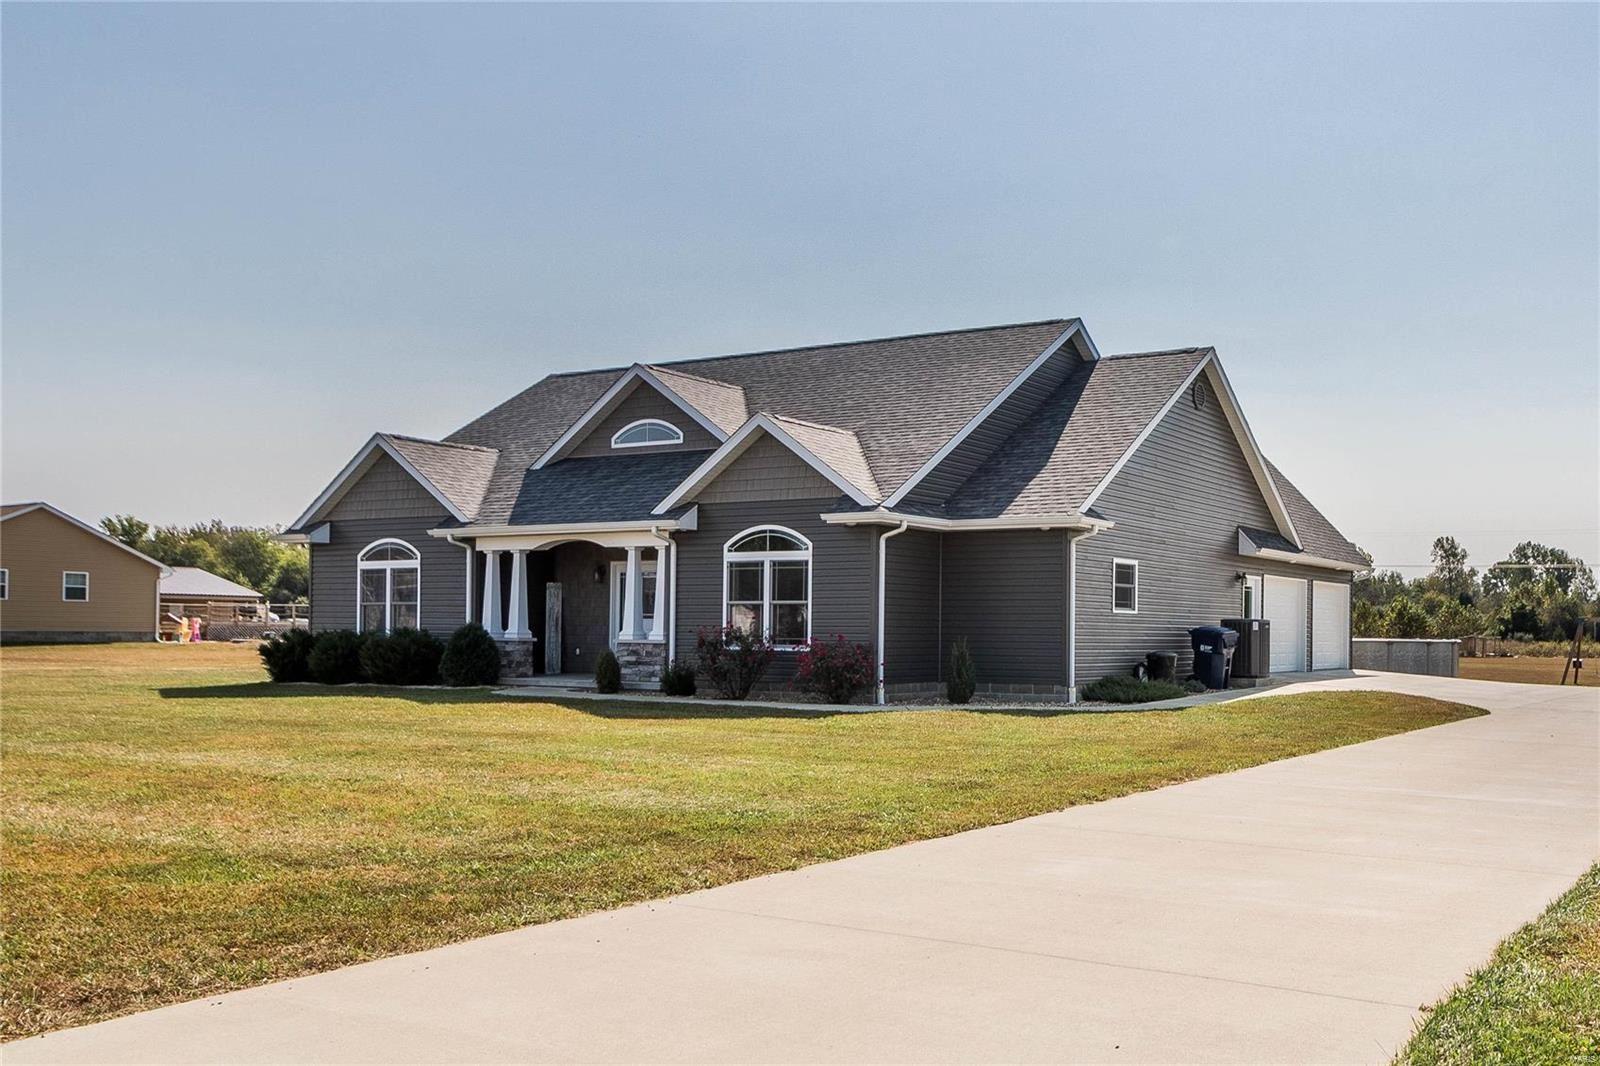 16703 Heatherbrooke Lane, Marion, IL 62959 - MLS#: 20073992